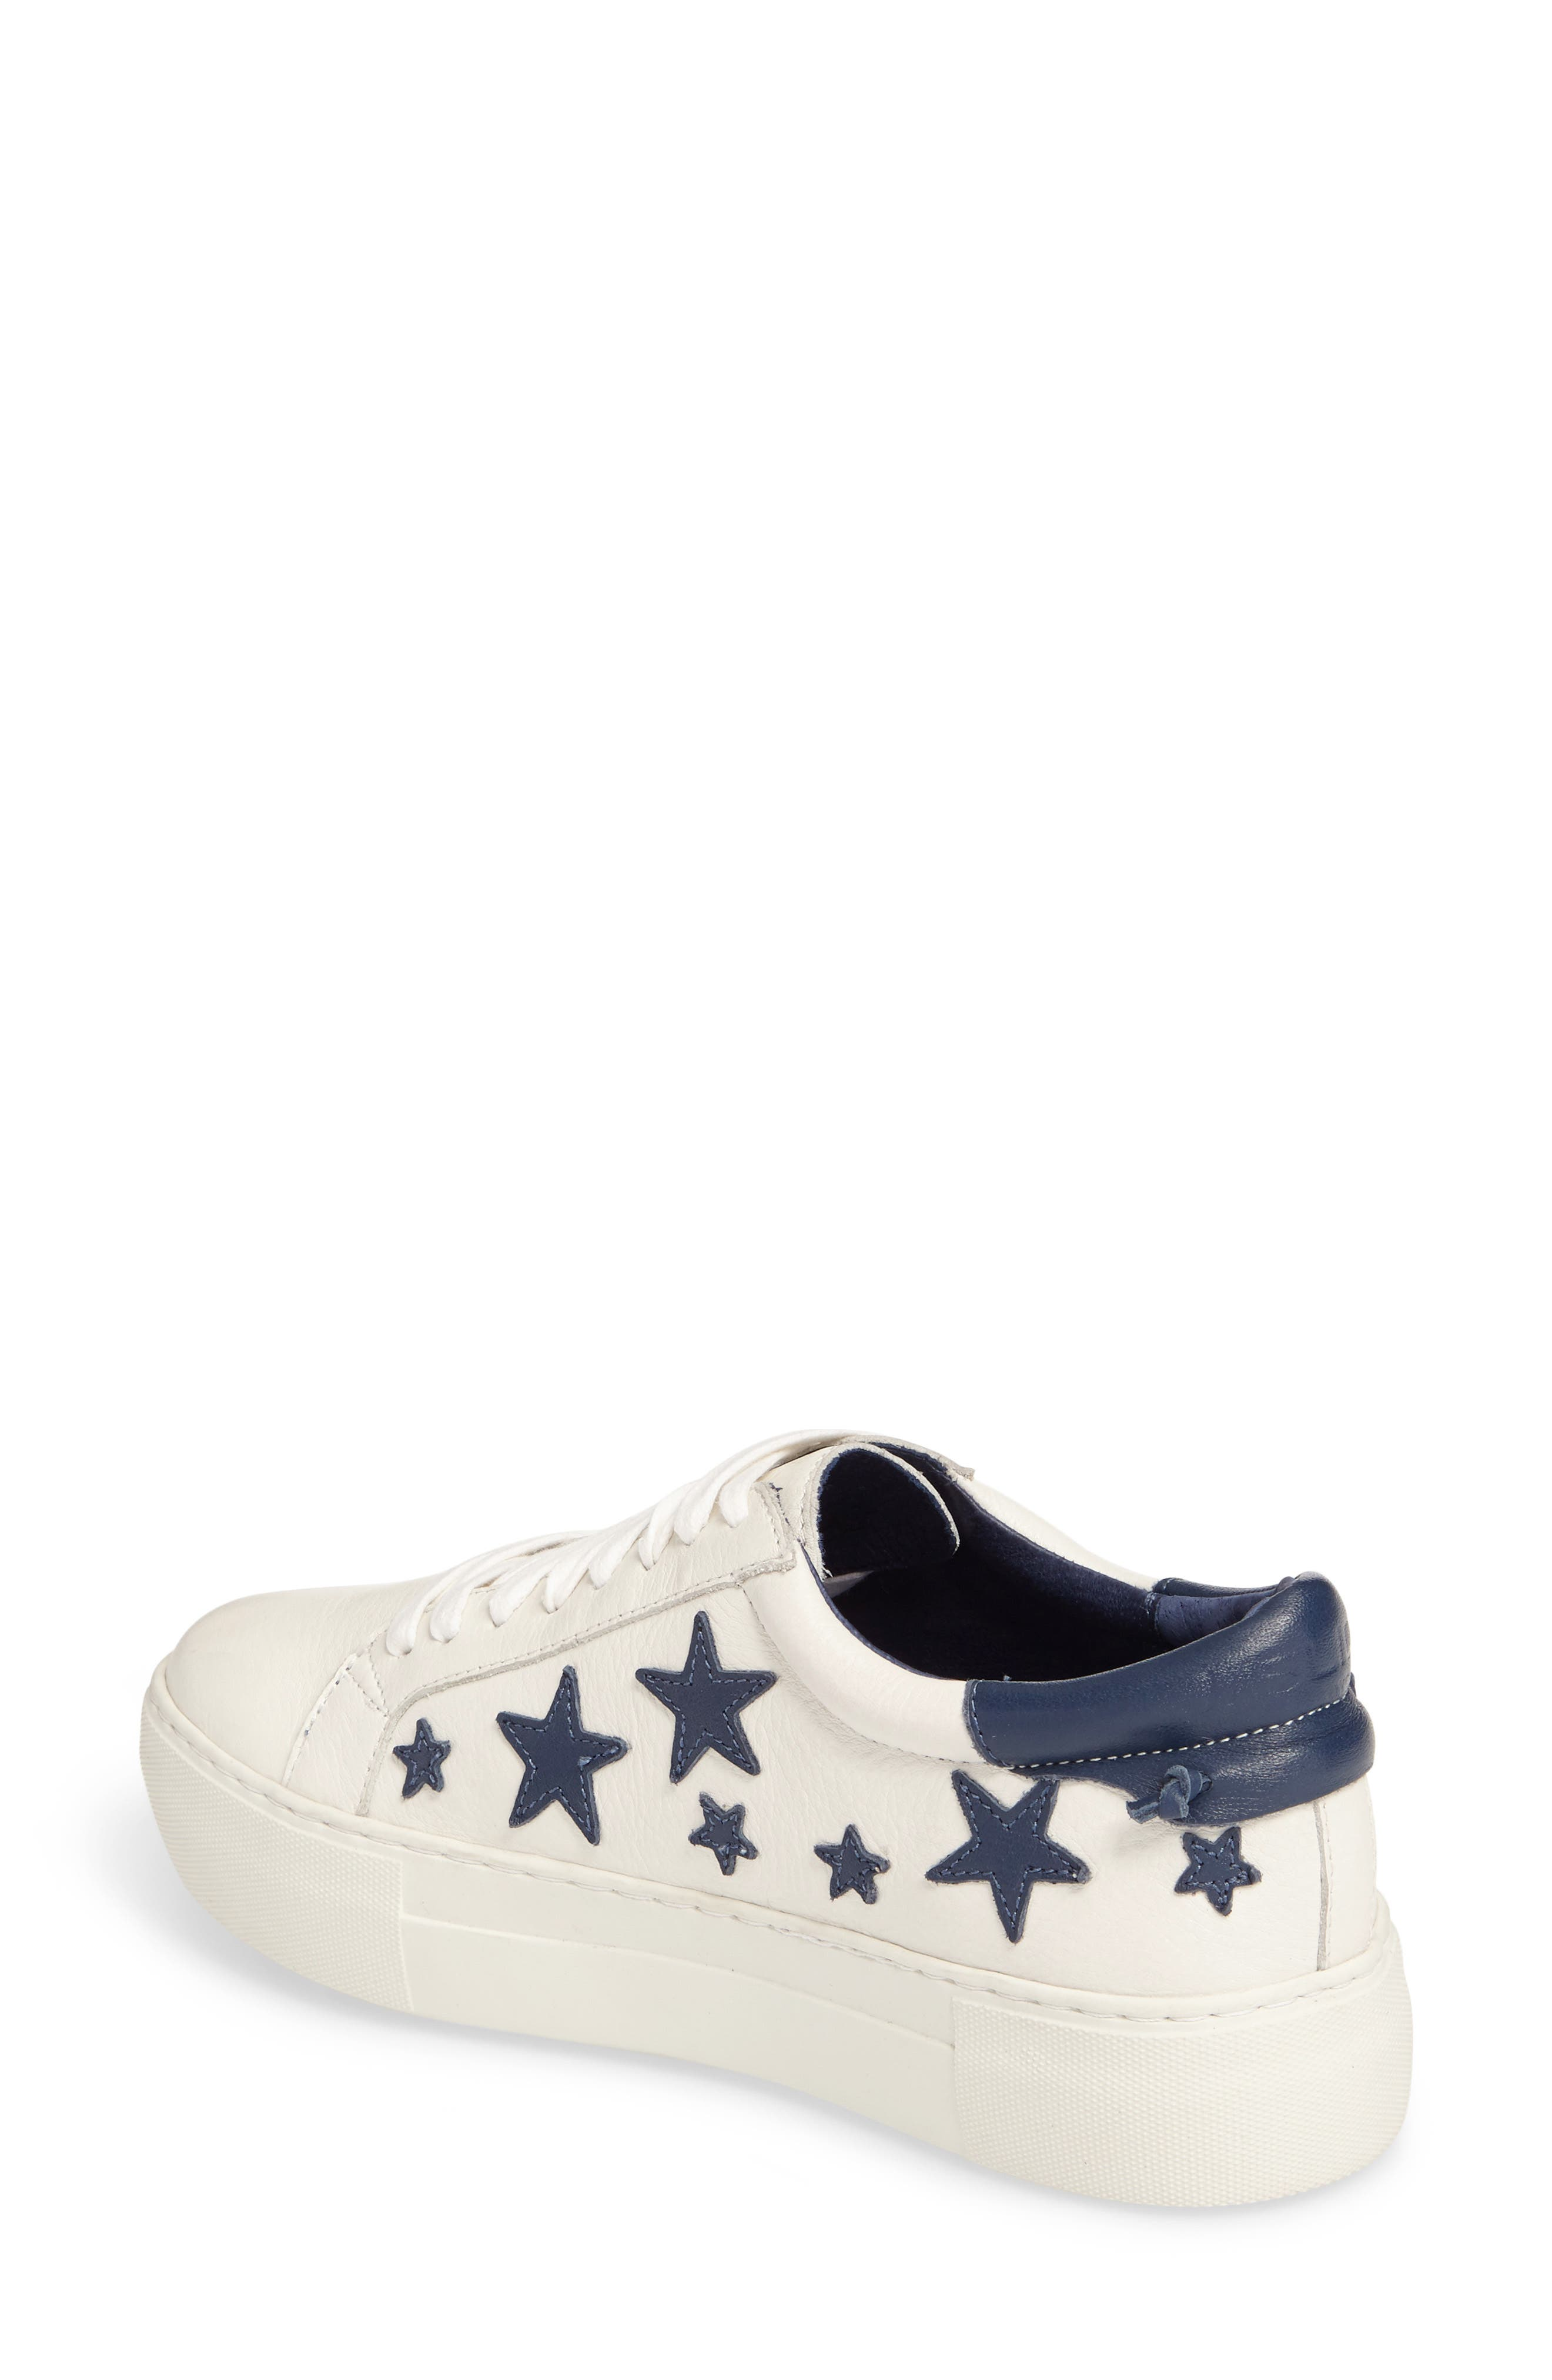 Alabama Sneaker,                             Alternate thumbnail 2, color,                             122